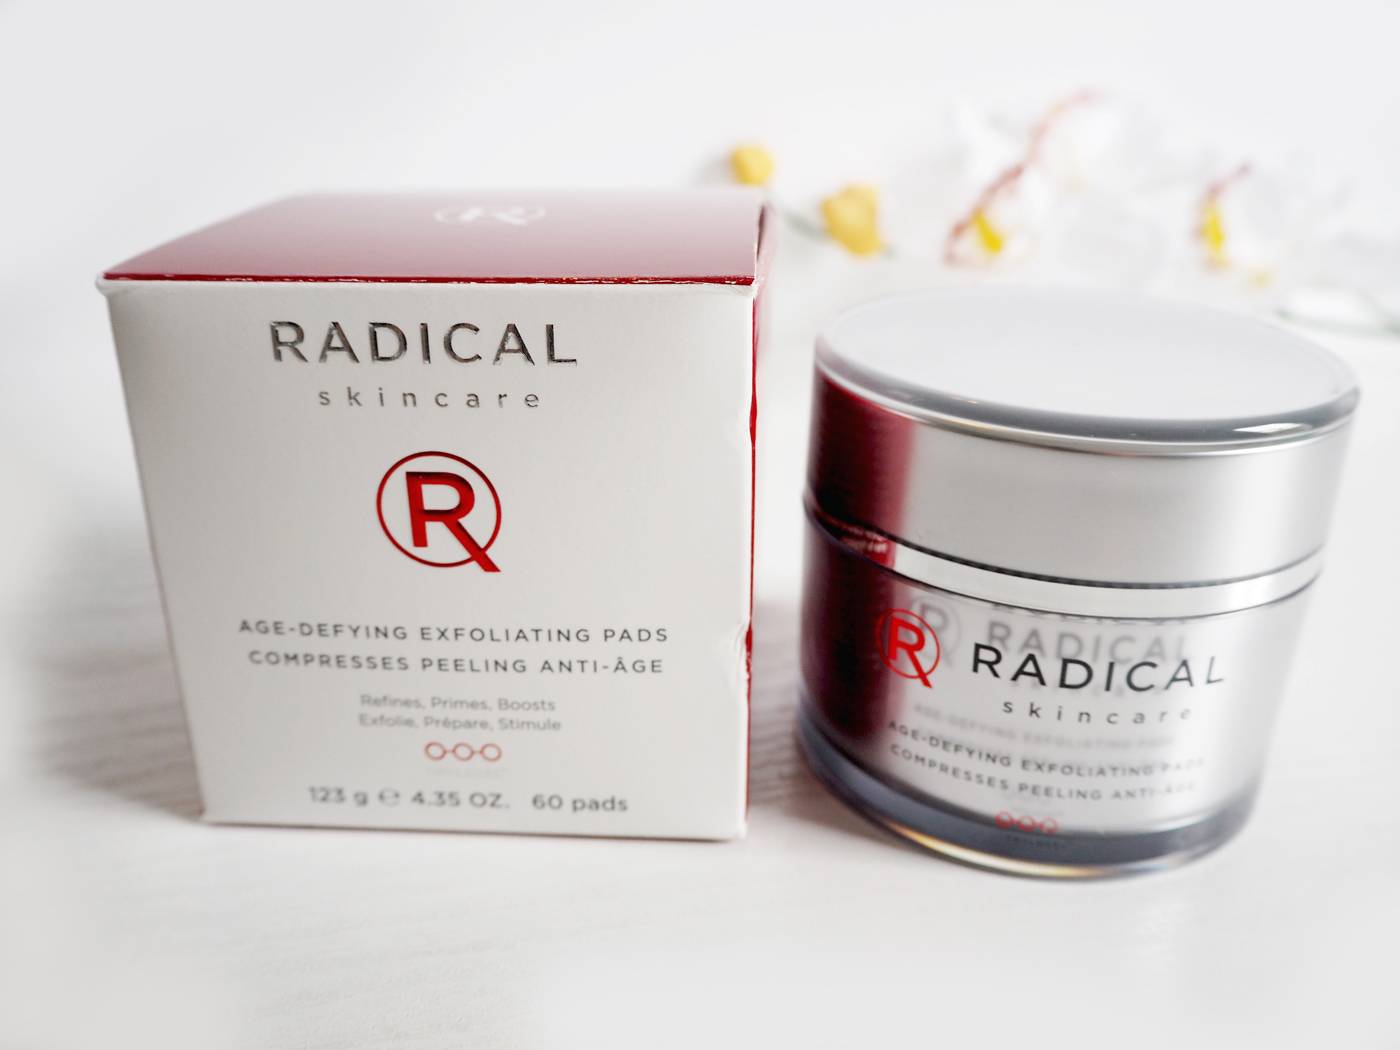 RADICAL-SKINCARE-EXFOLIATING-PADS.1